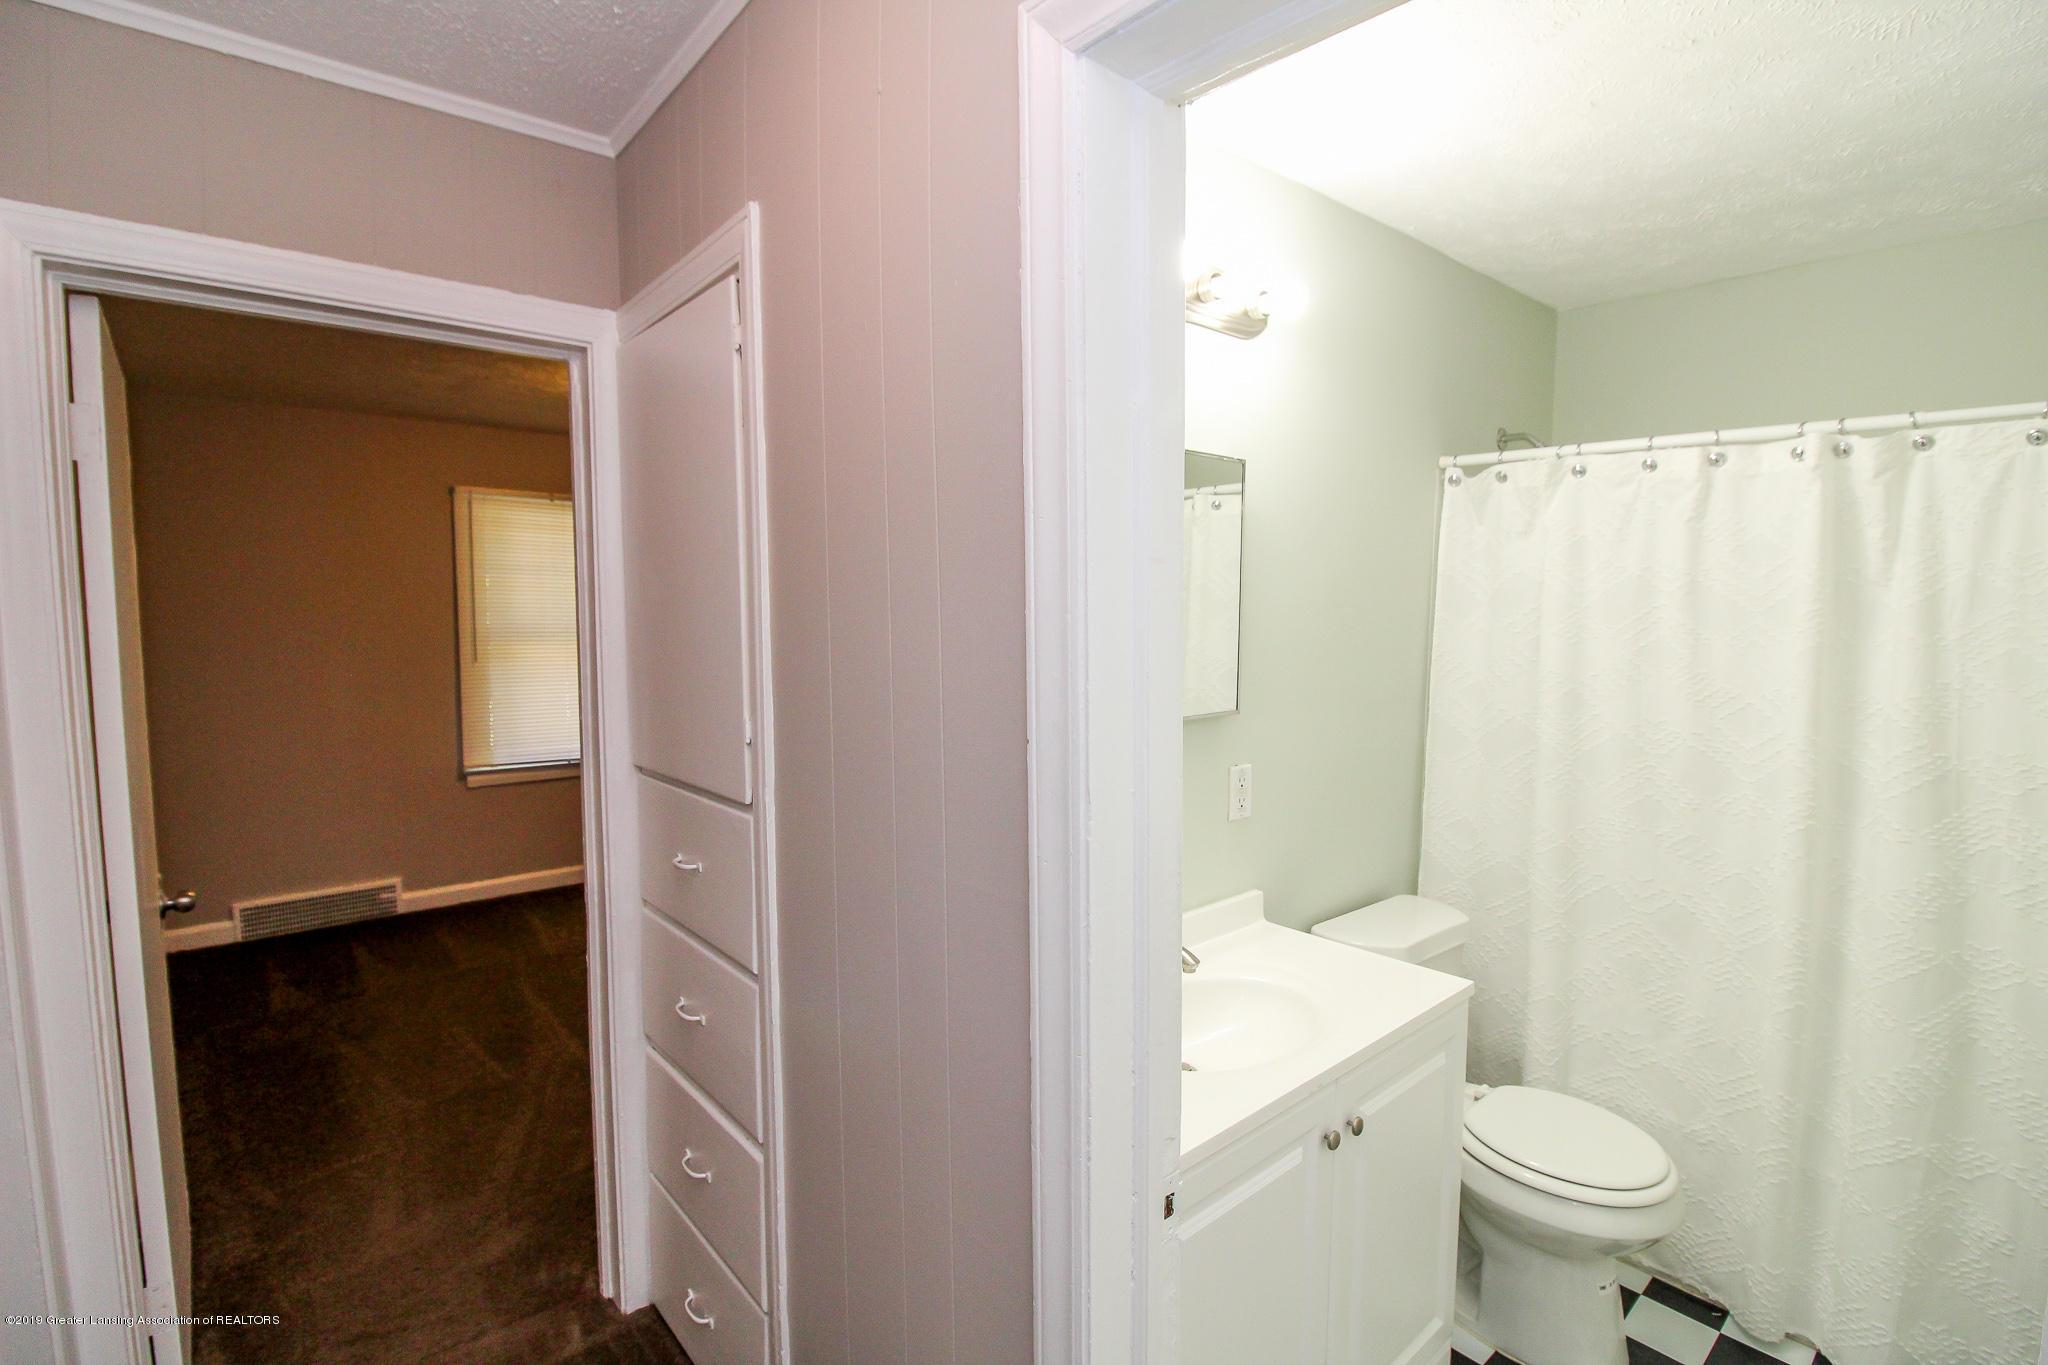 124 Northlawn Ave - 23 First Floor Bathroom 4 - 19